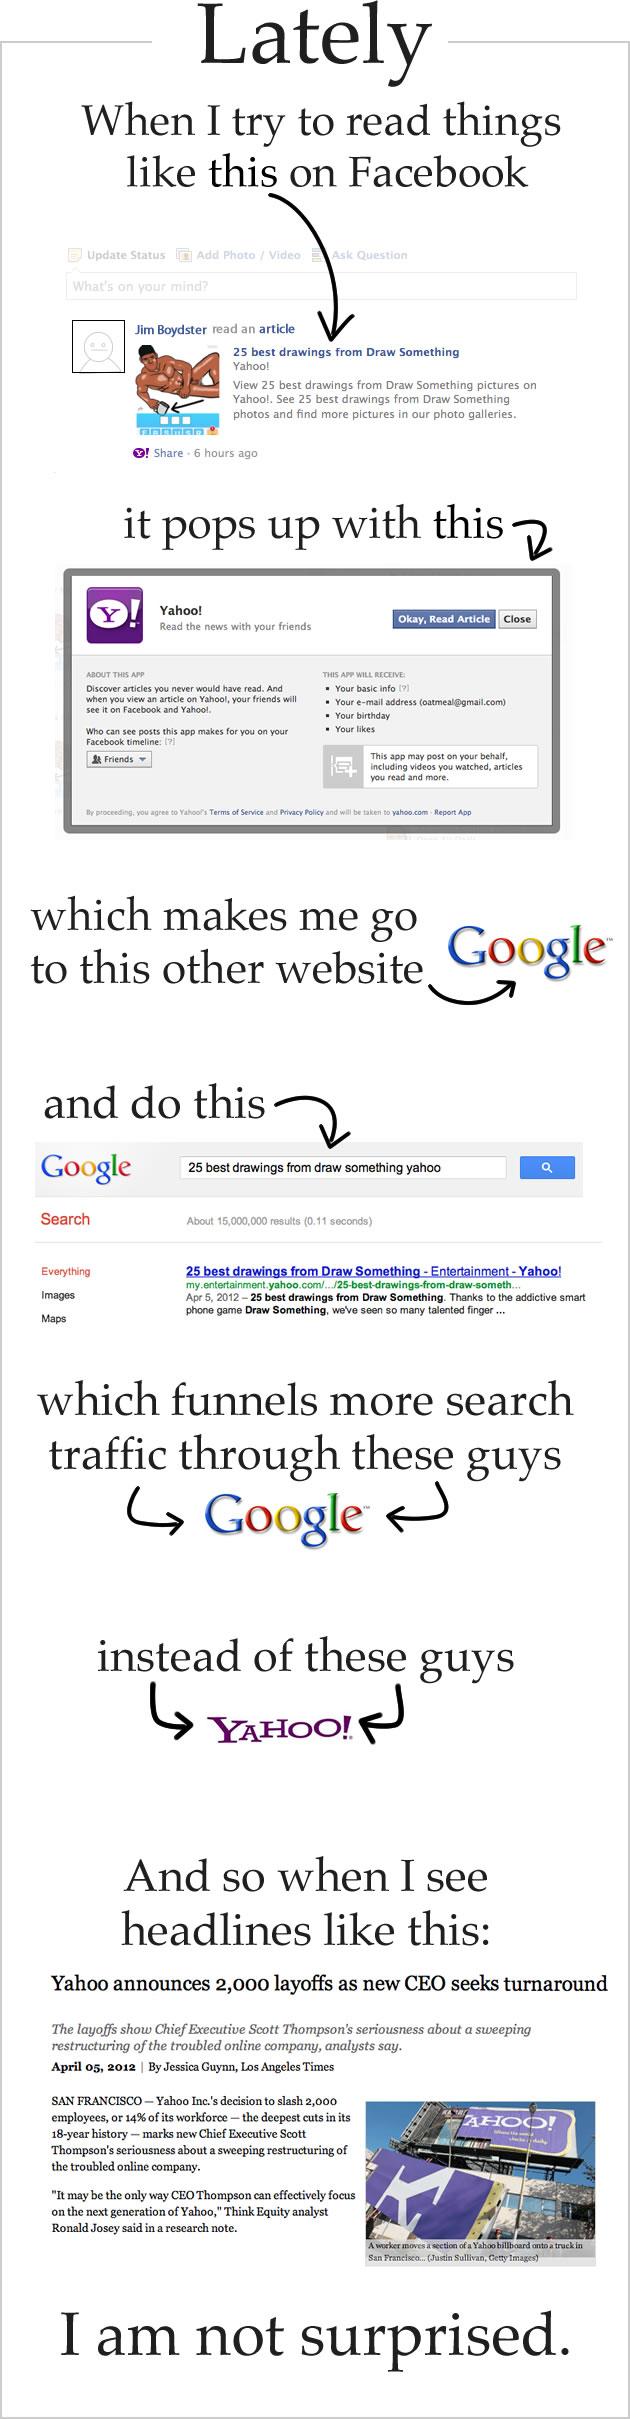 Yahoo's genius content strategy